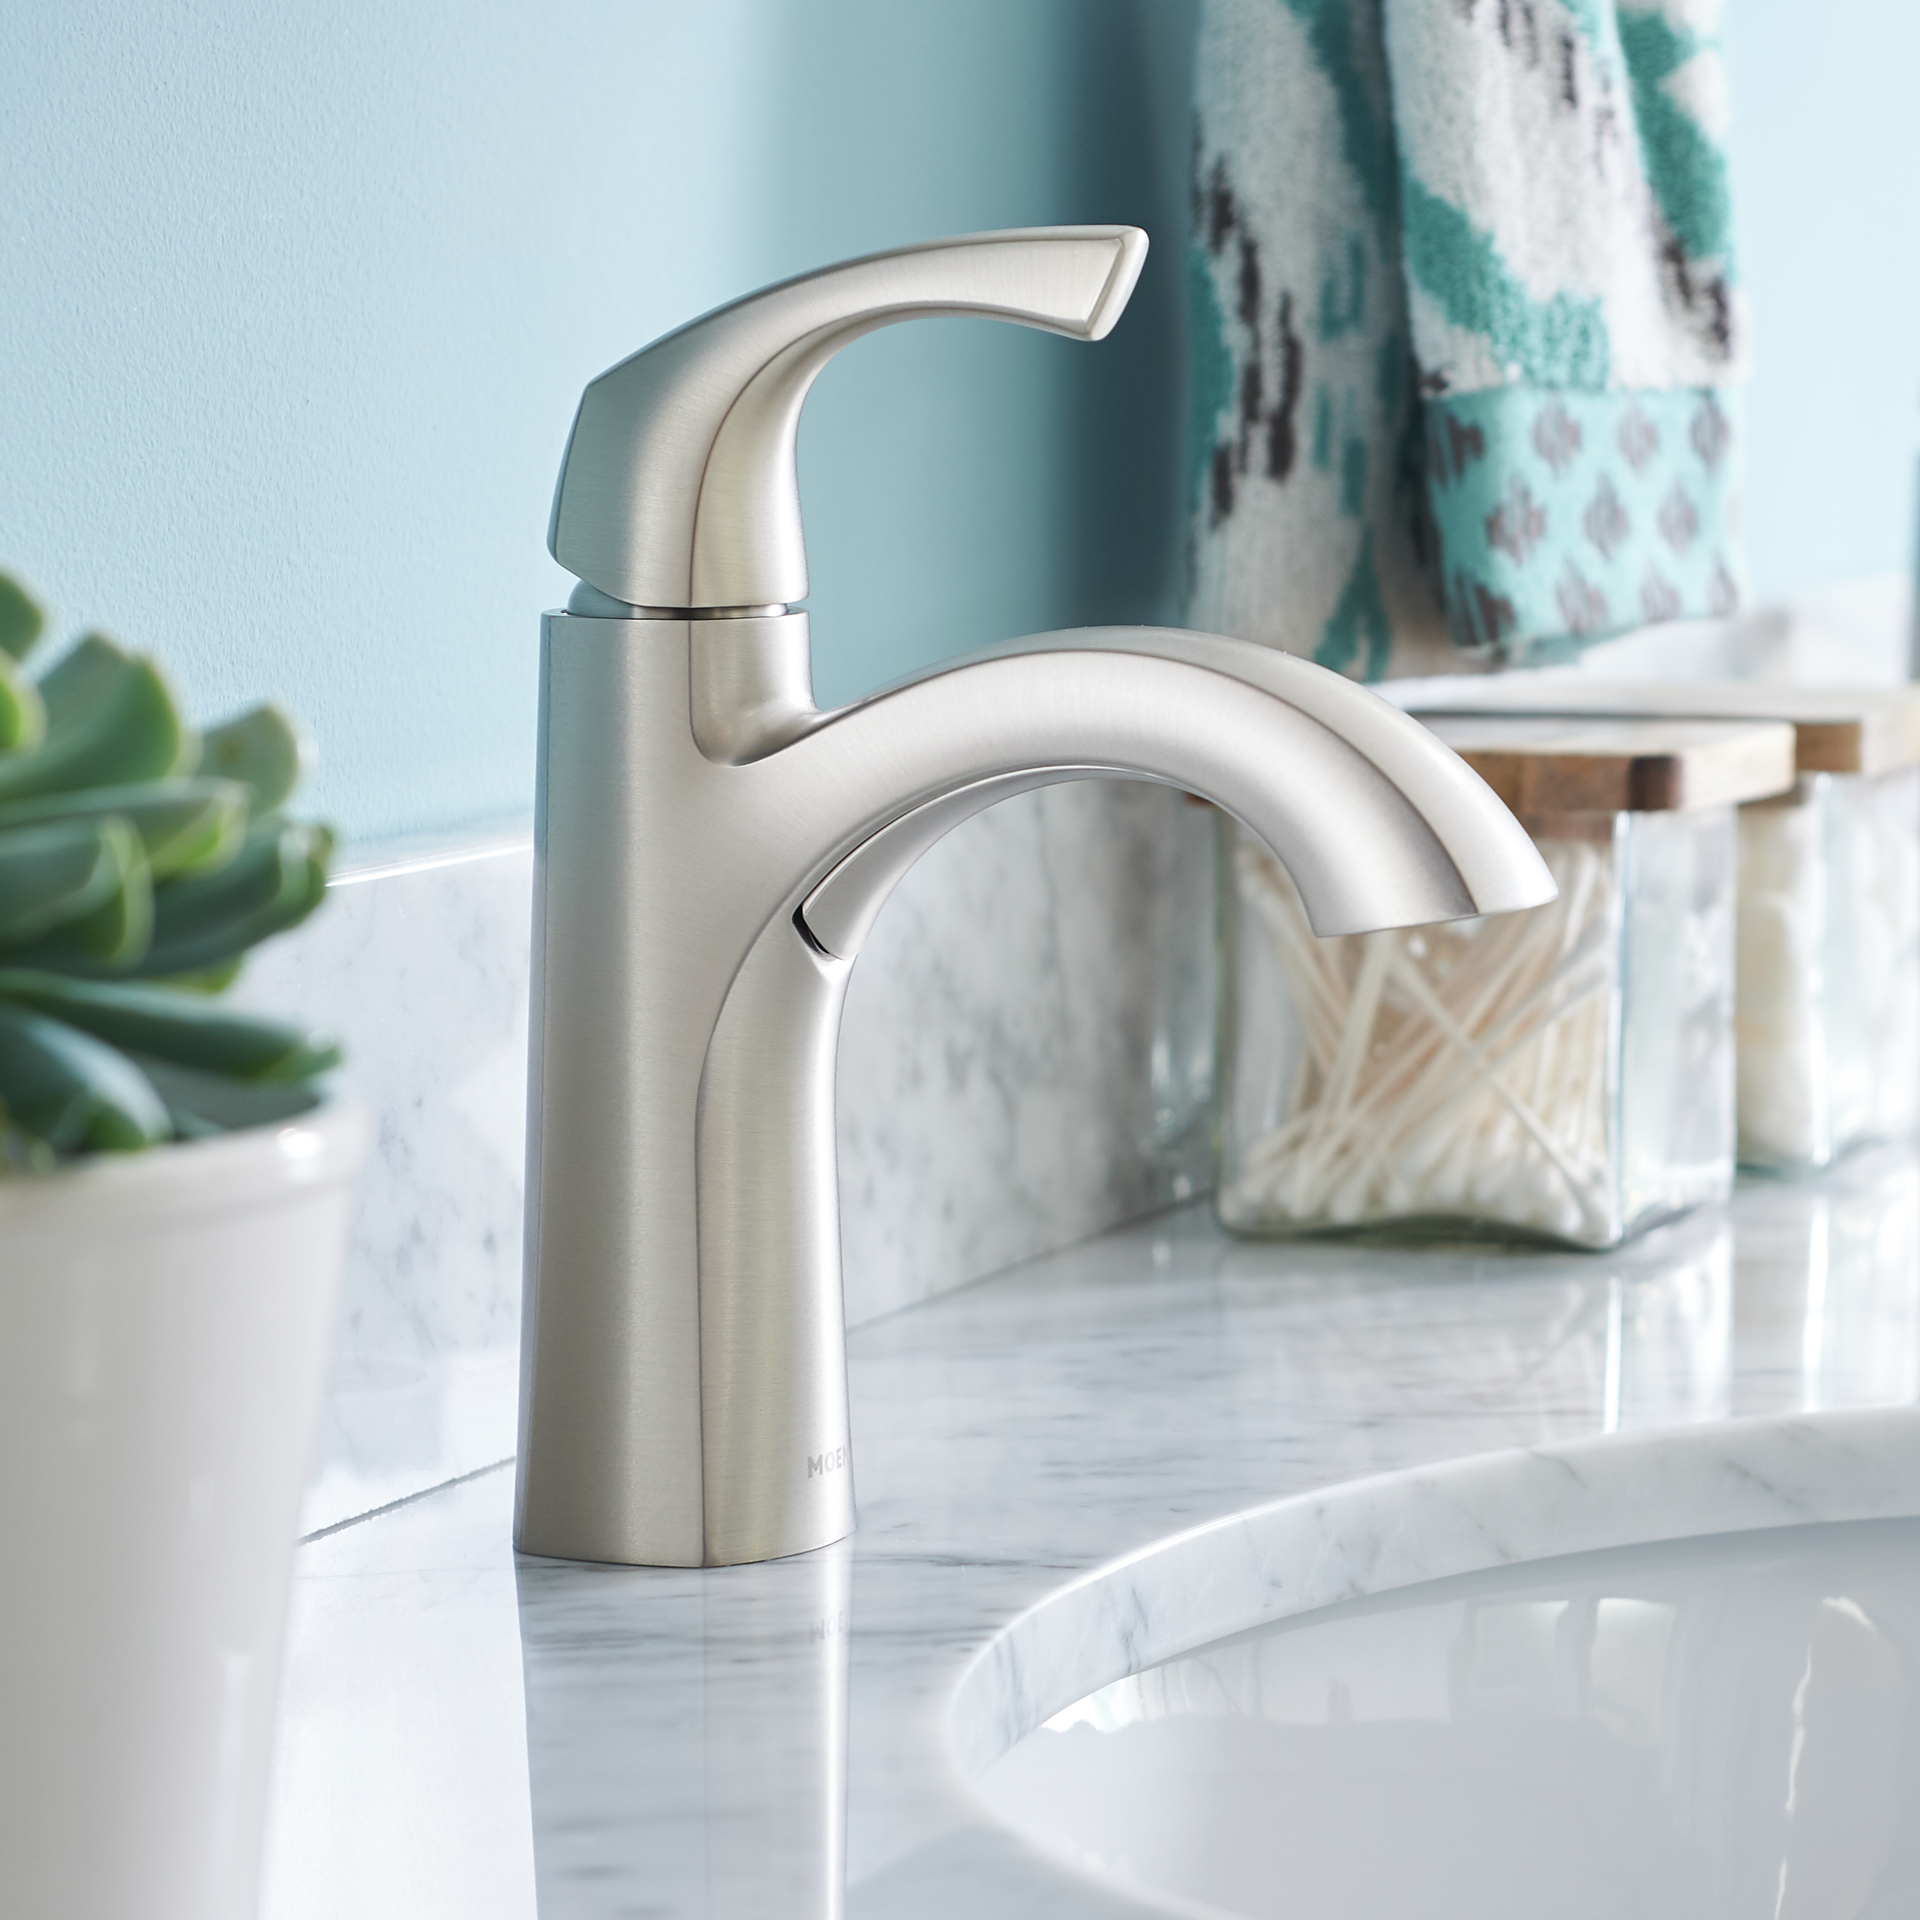 Moen Lindor Spot Resist Brushed Nickel 1 Handle Single Hole 4 In Centerset Watersense Bathroom Faucets Bathroom Faucets Brushed Nickel High Arc Bathroom Faucet